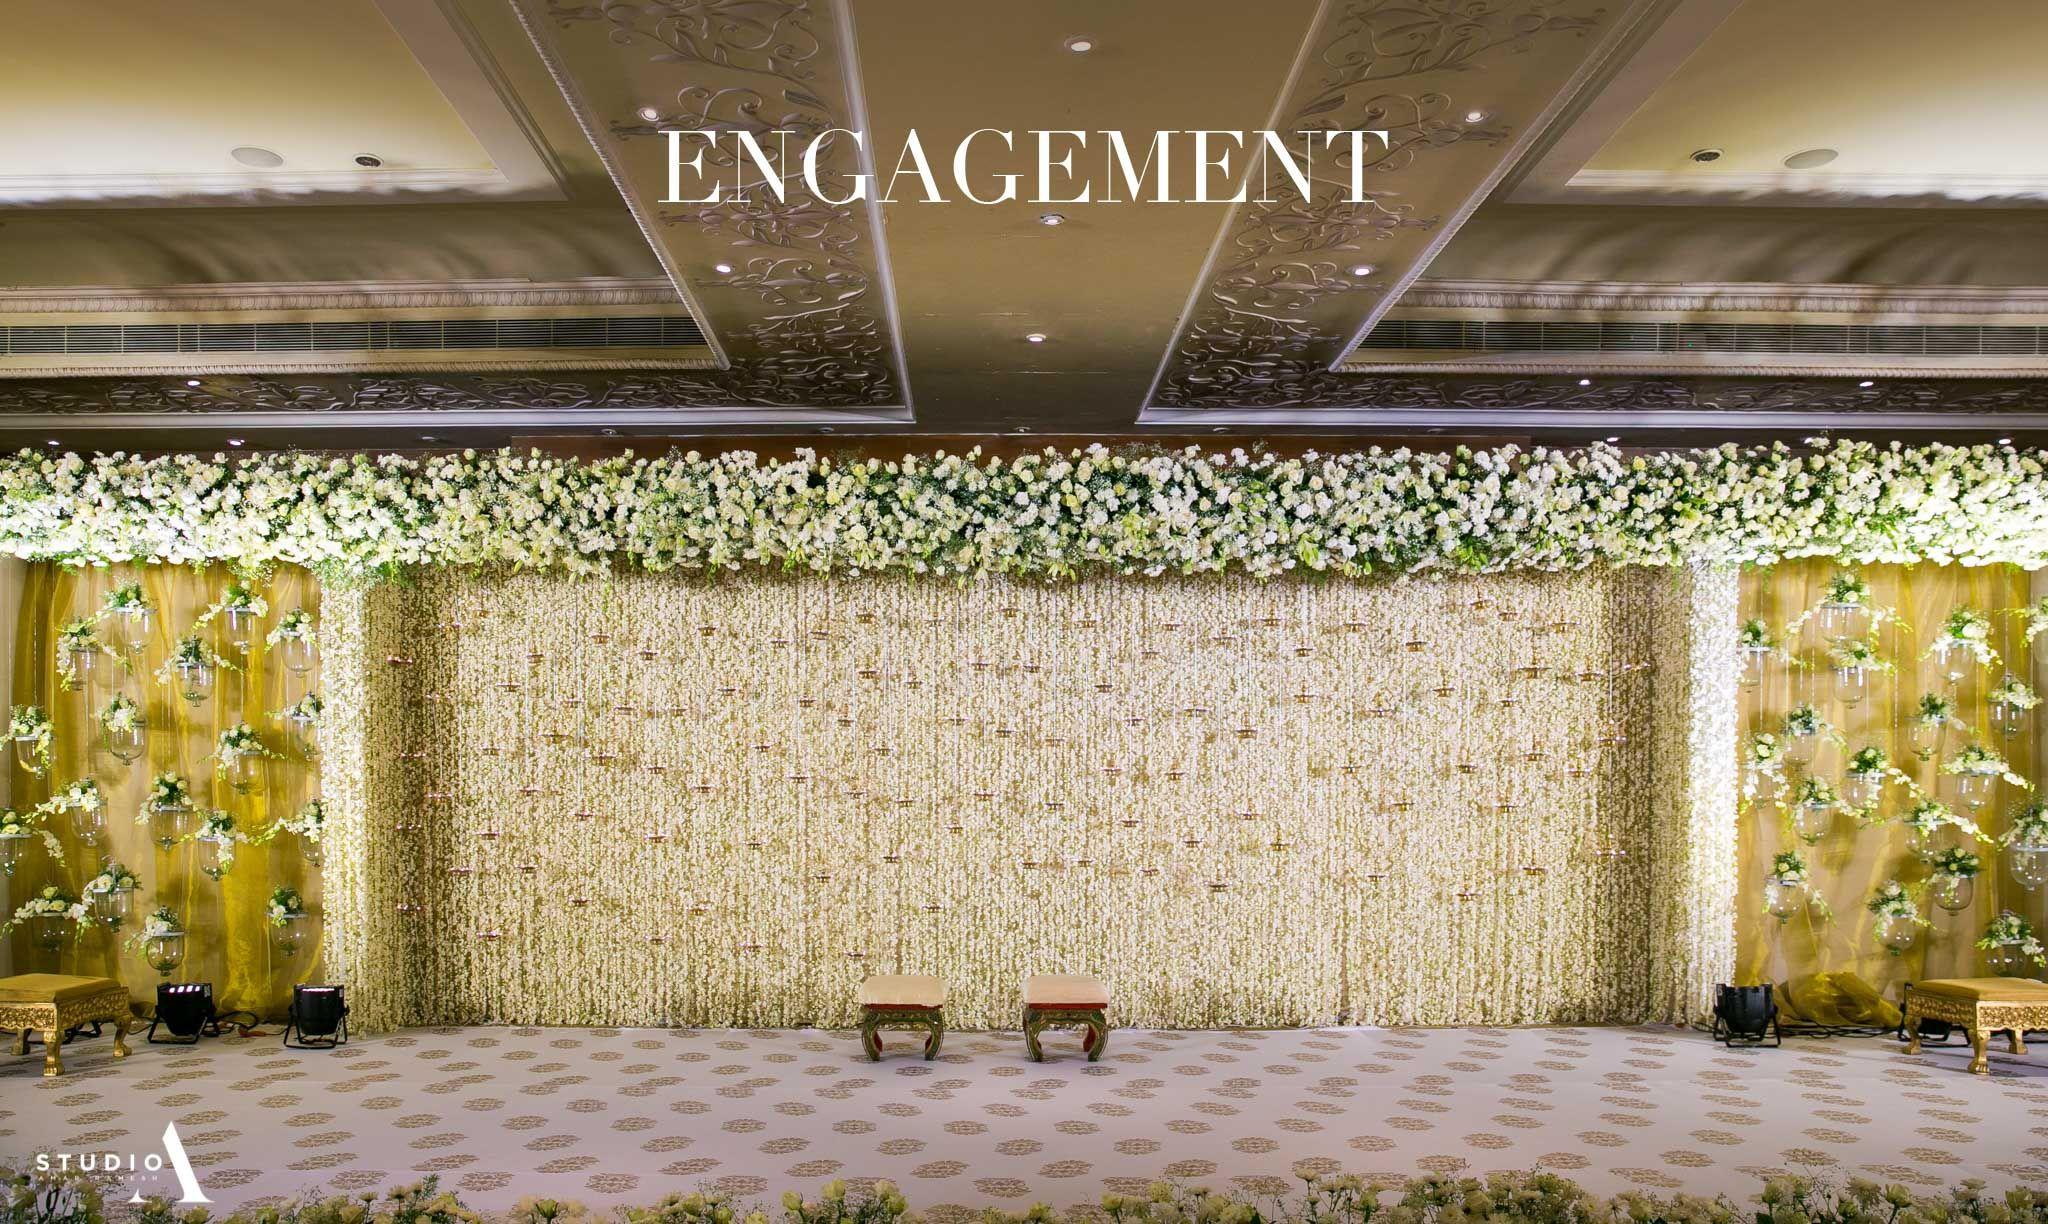 Wedding stage decoration design  Timeless Memories  Inspiration  Pinterest  Weddingideas Telugu